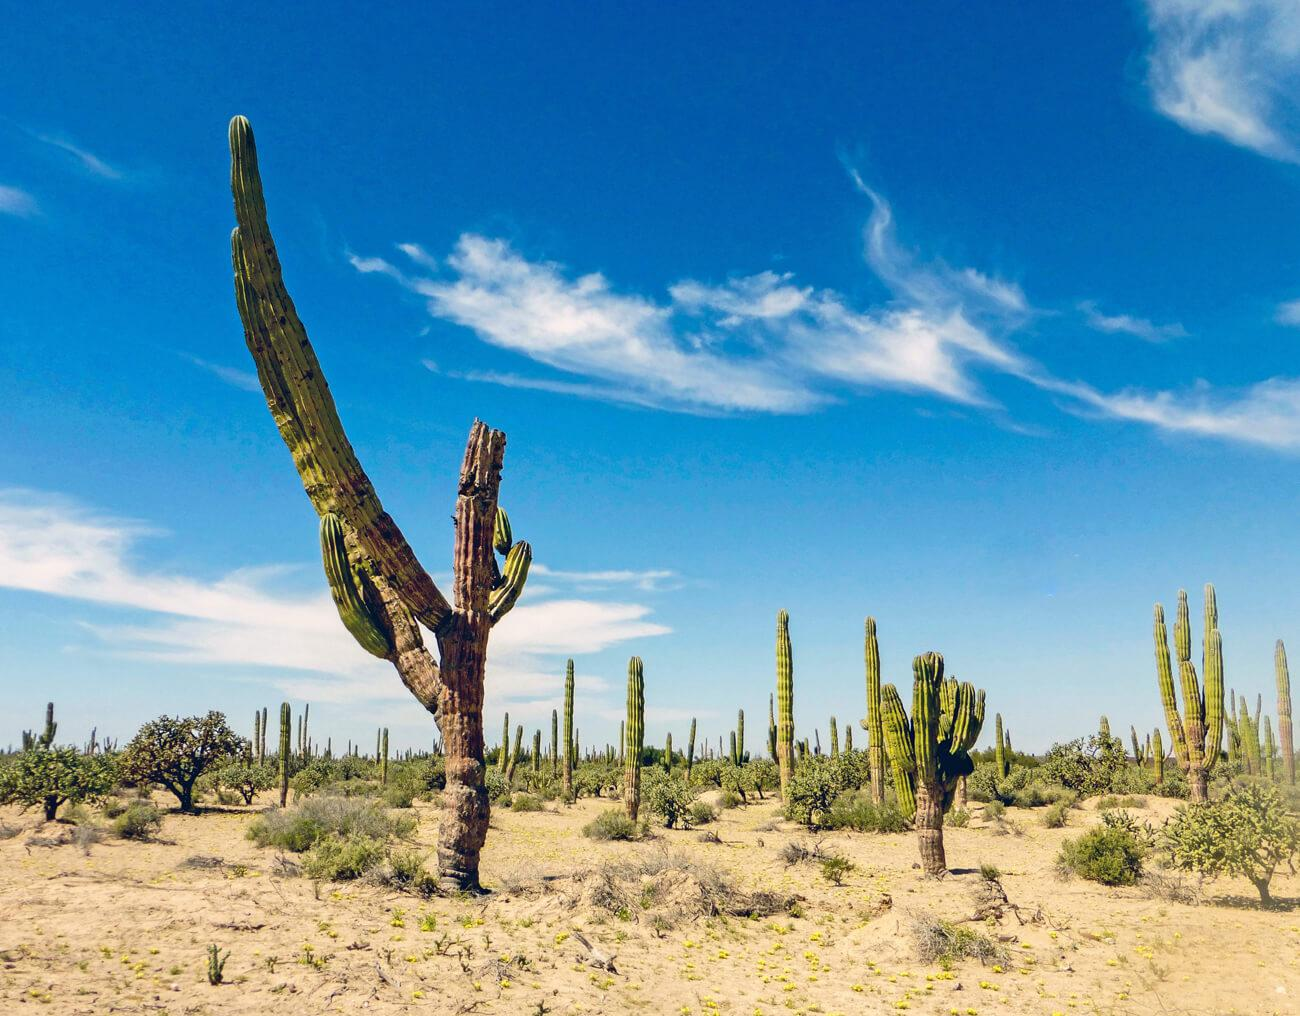 Cardon cactus dominate the Vizcaino Desert landscape. © Roger Harris